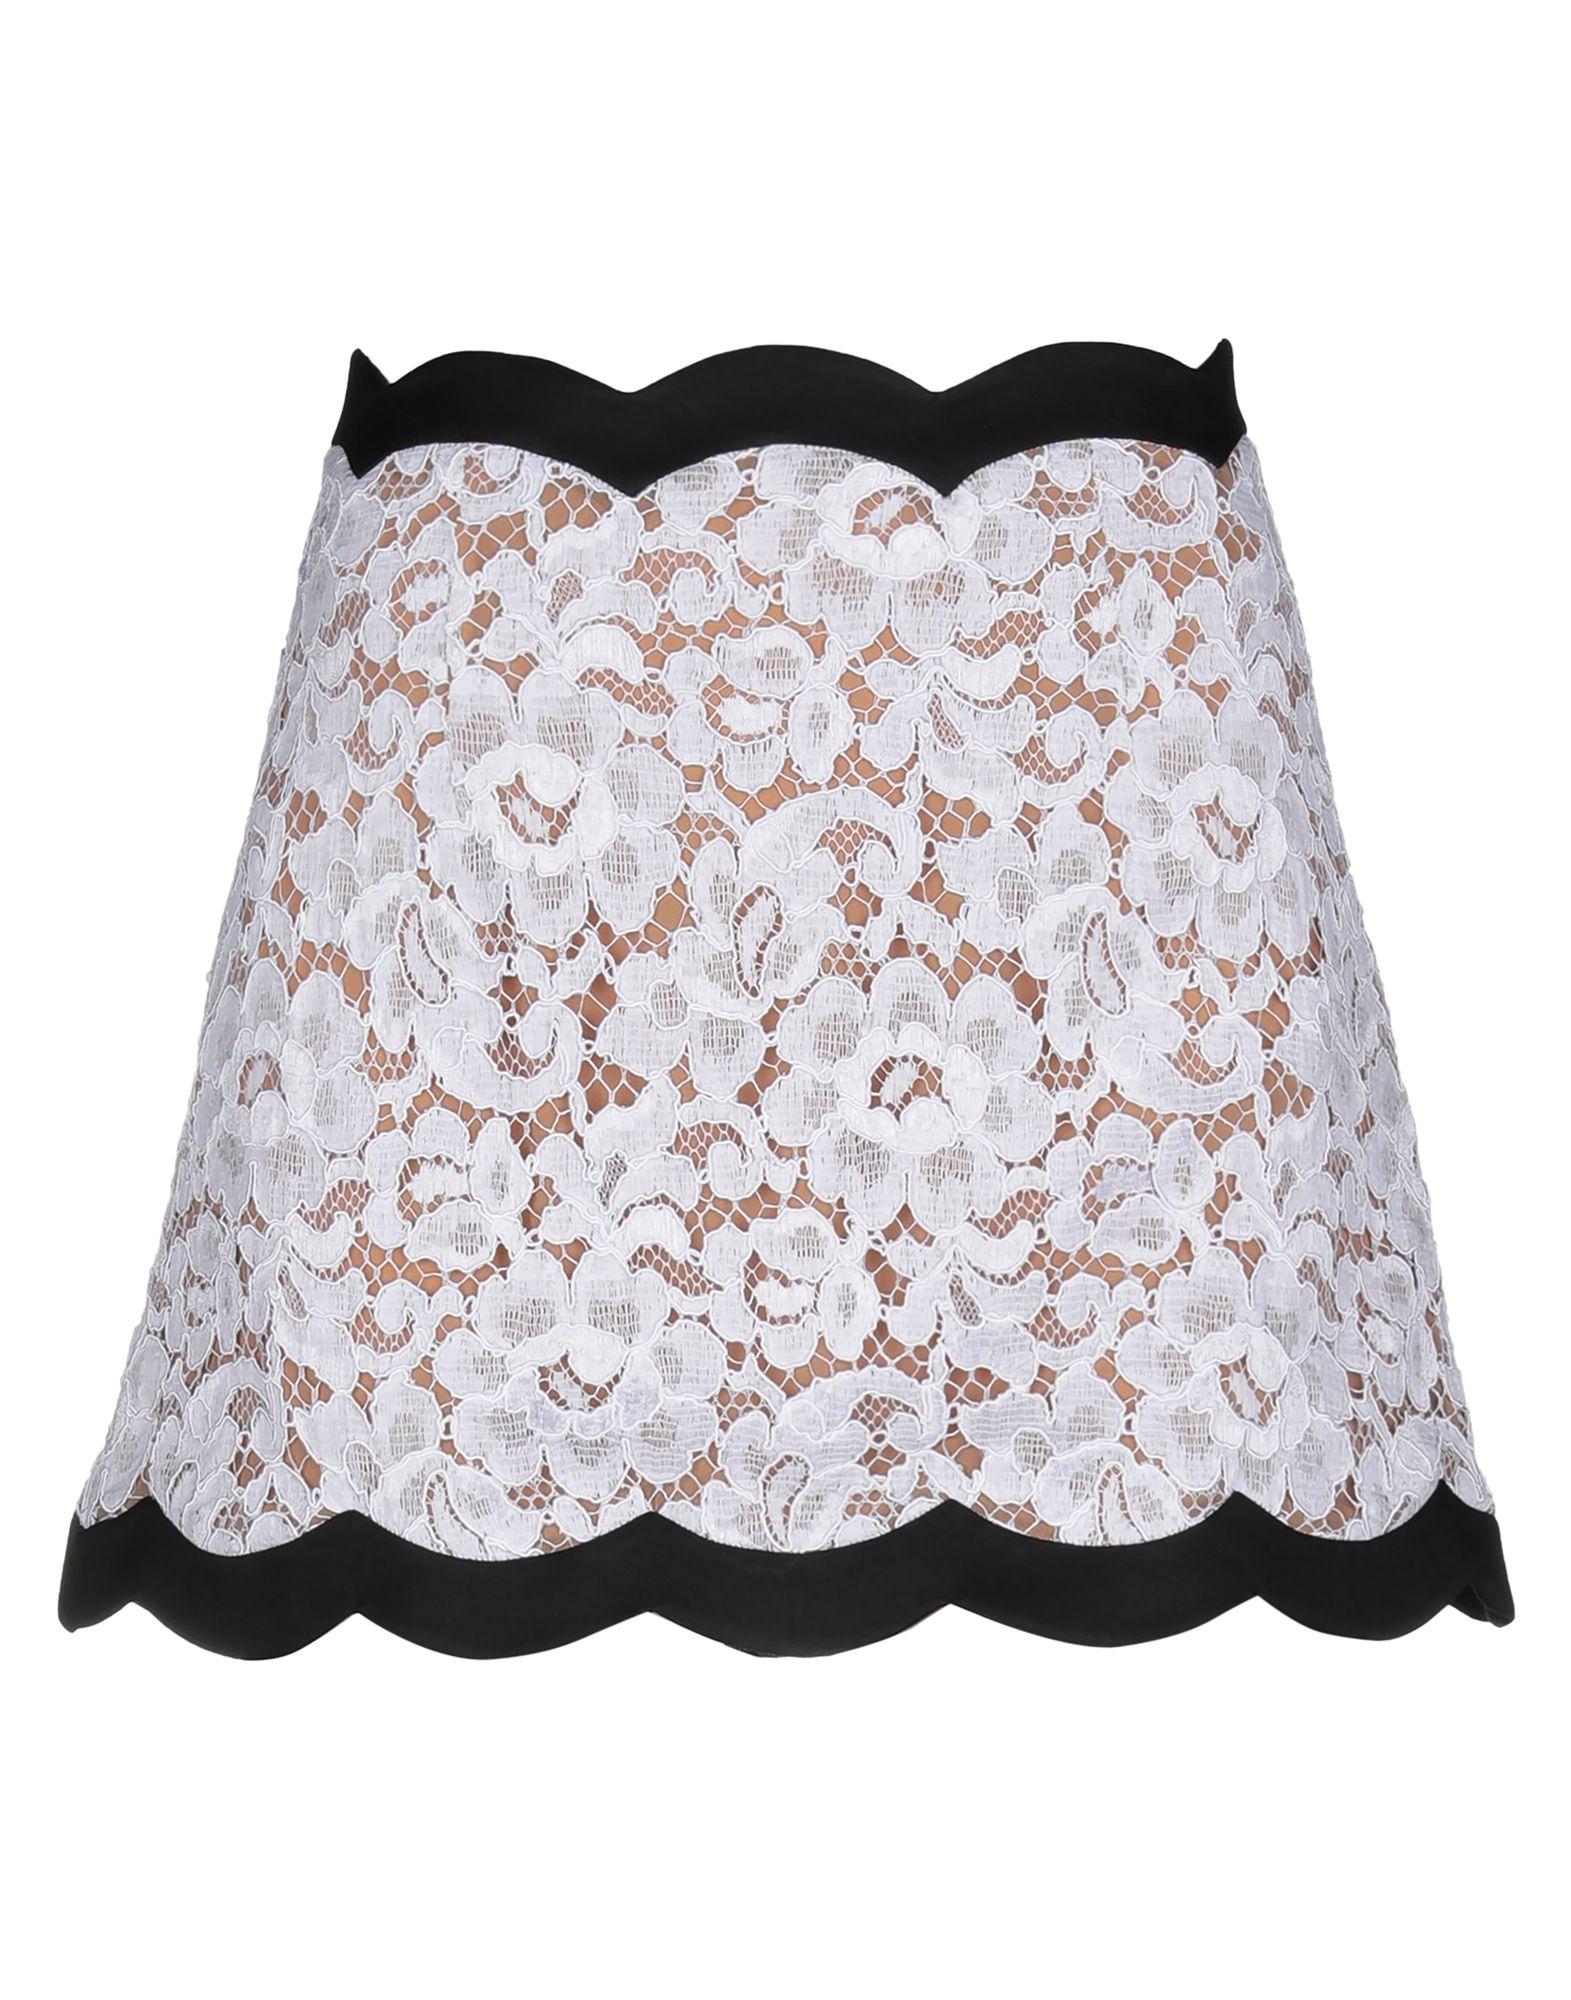 MICHAEL KORS COLLECTION Мини-юбка цены онлайн